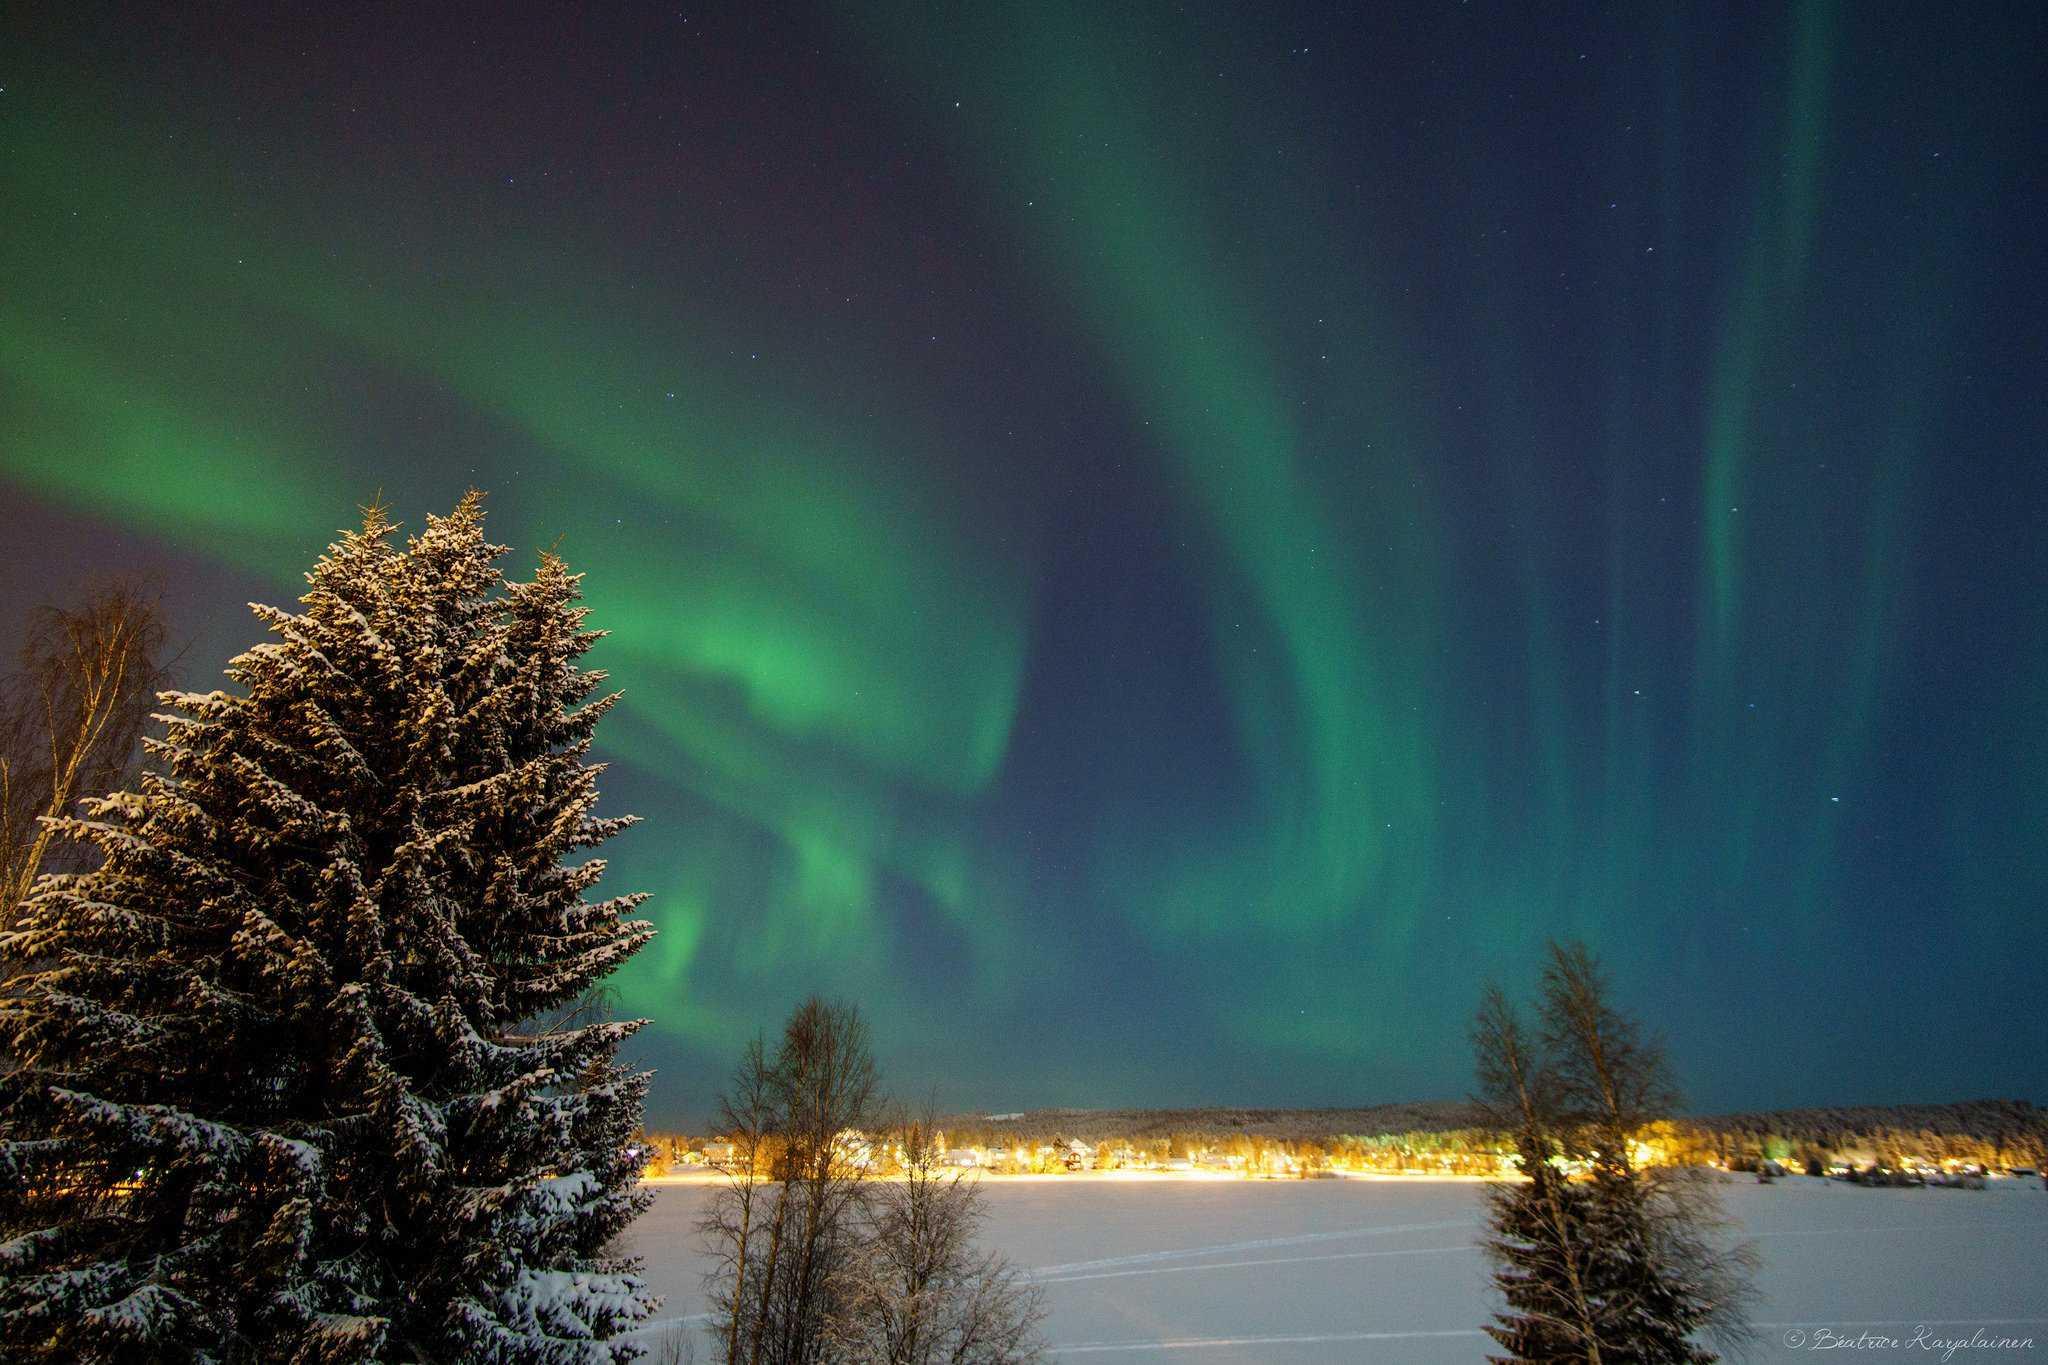 Northern Lights in Sweden in Winter - Photo by Béatrice Karjalainen via Flickr